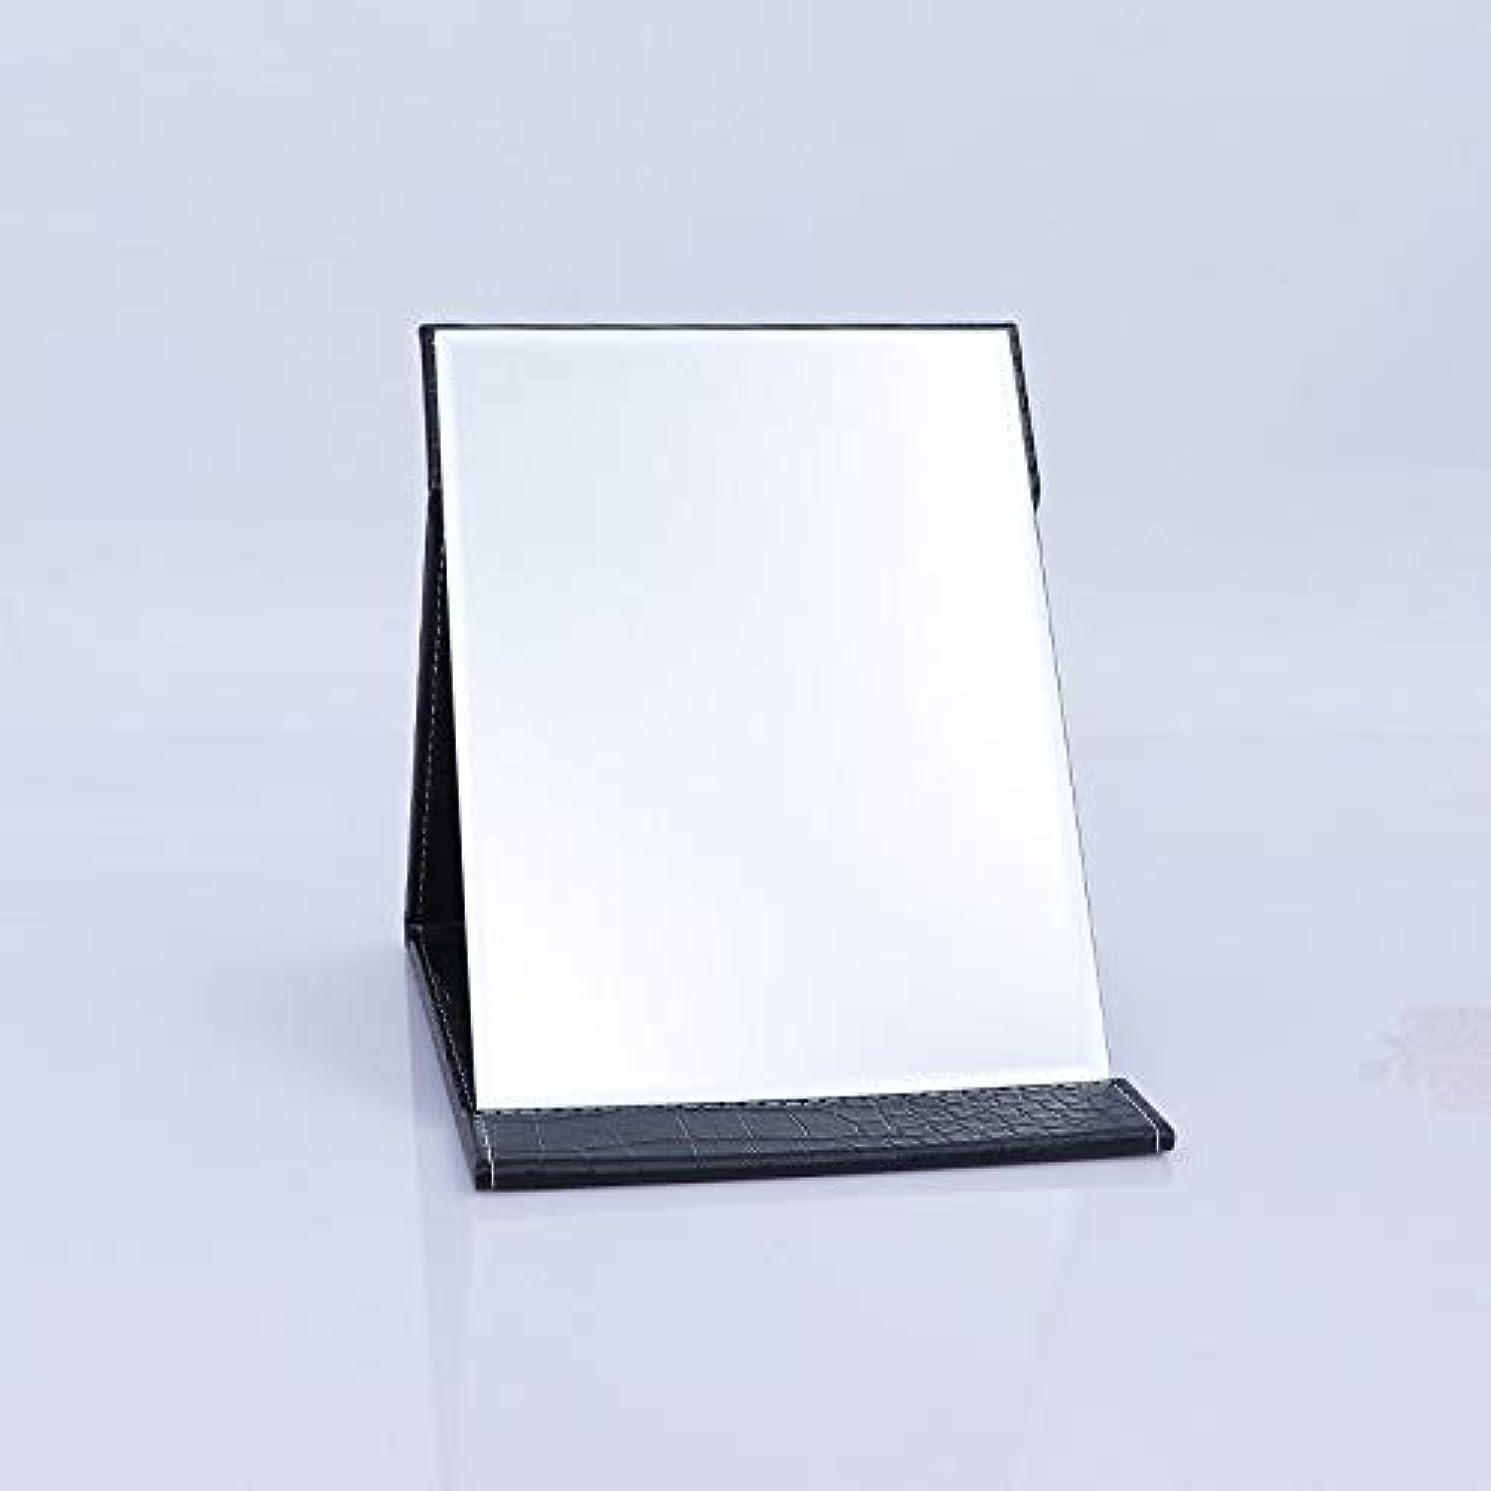 Takelablaze 化粧鏡 折立ミラー 卓上スタンドミラー 折りたたみミラー PUレザー ブラック